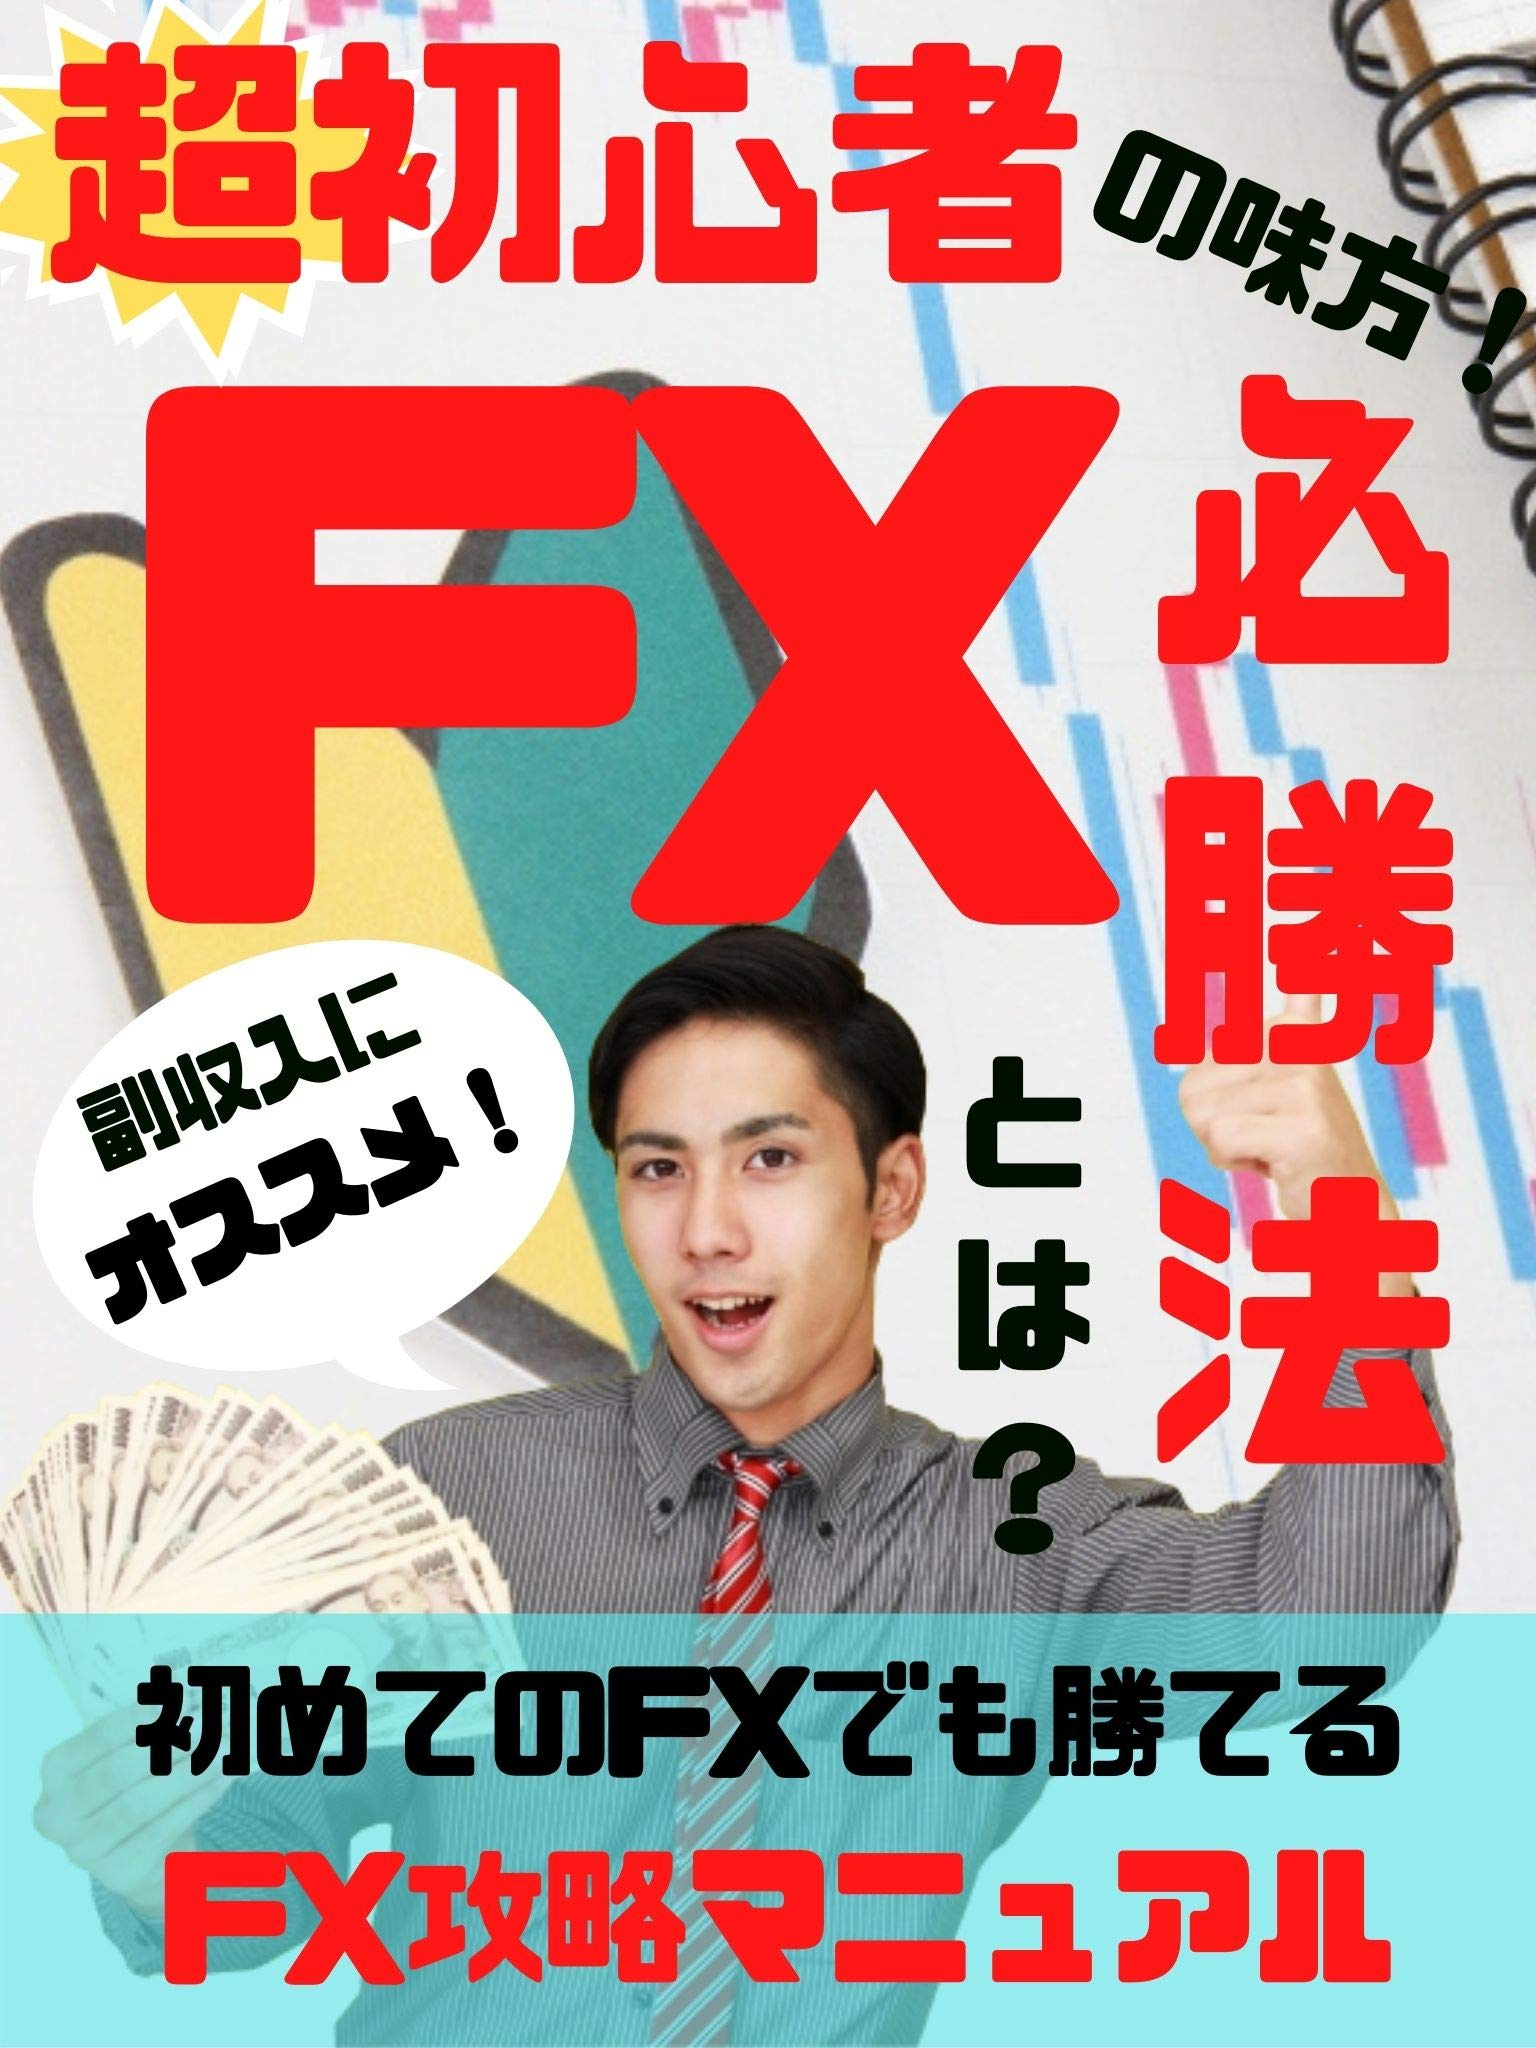 choshosinshanomikatafxhisshohoutoha (Japanese Edition)